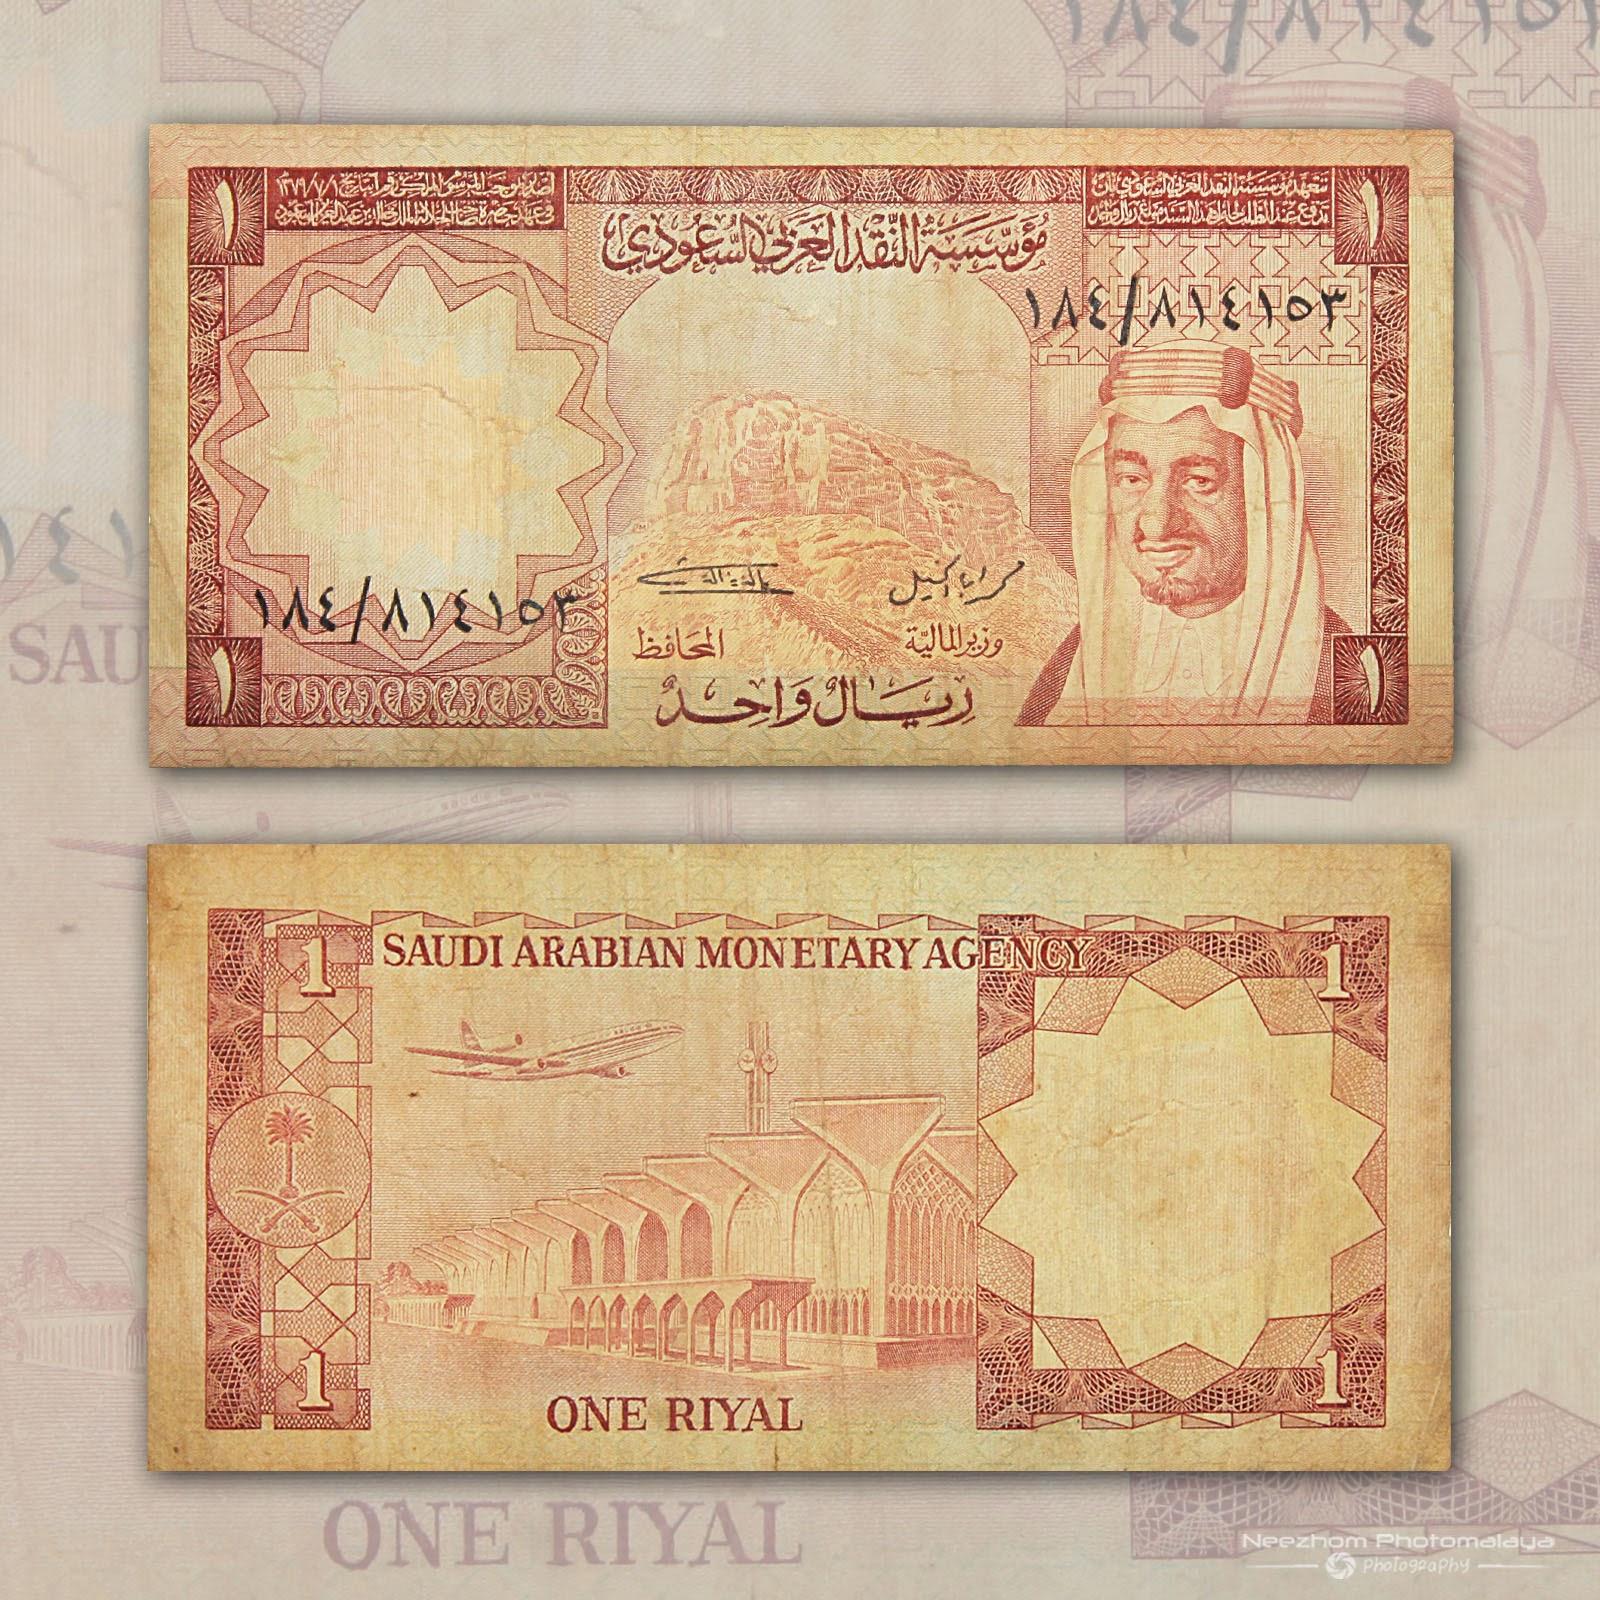 Saudi Arabia banknote 1 Riyal 1977